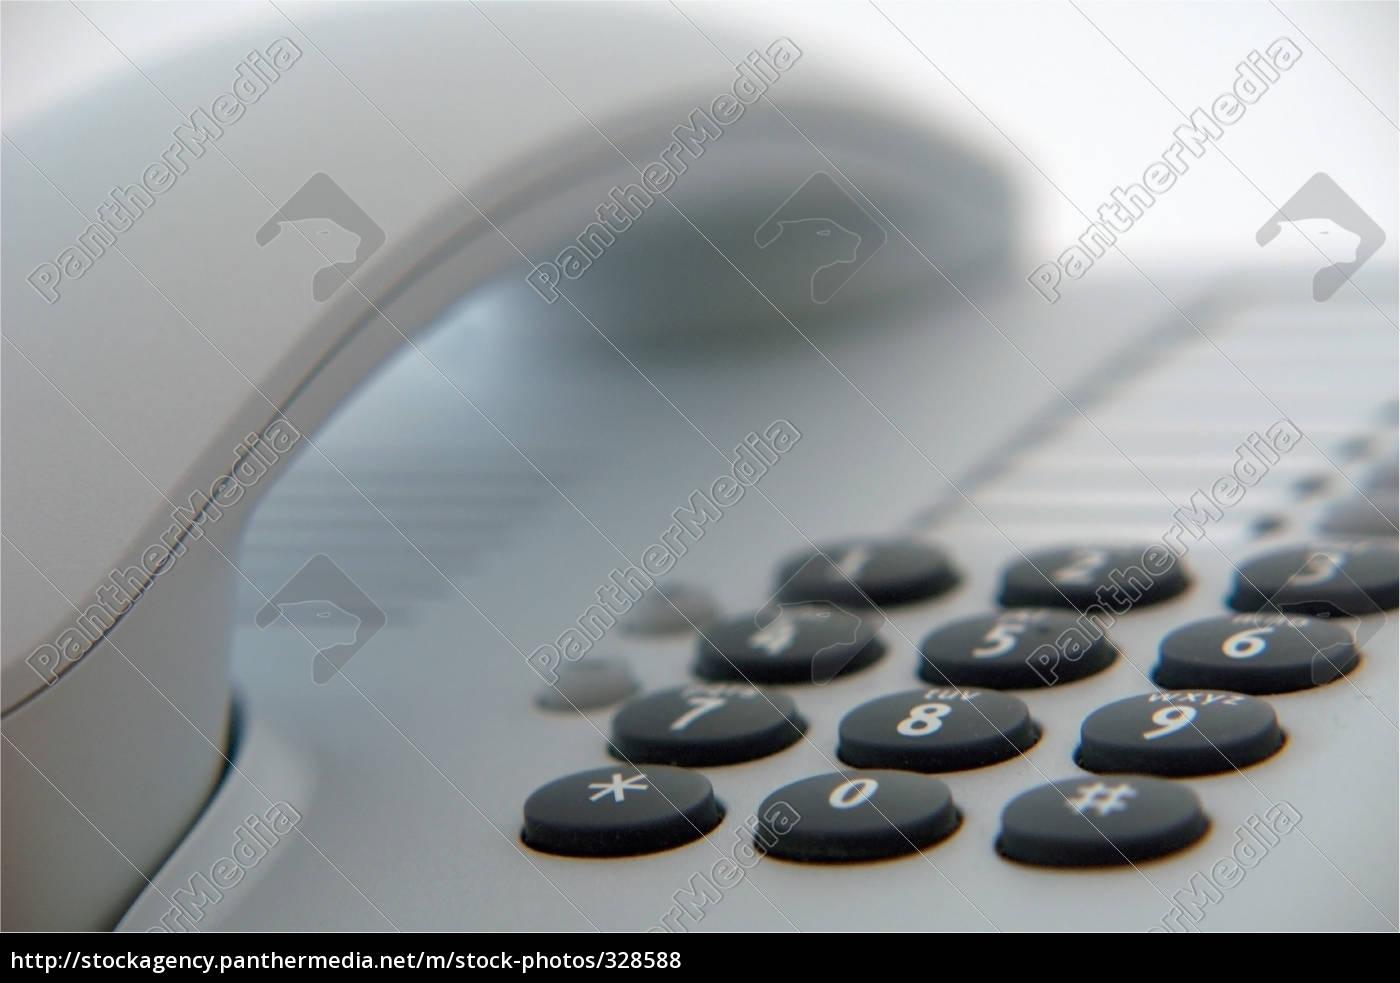 phone - 328588